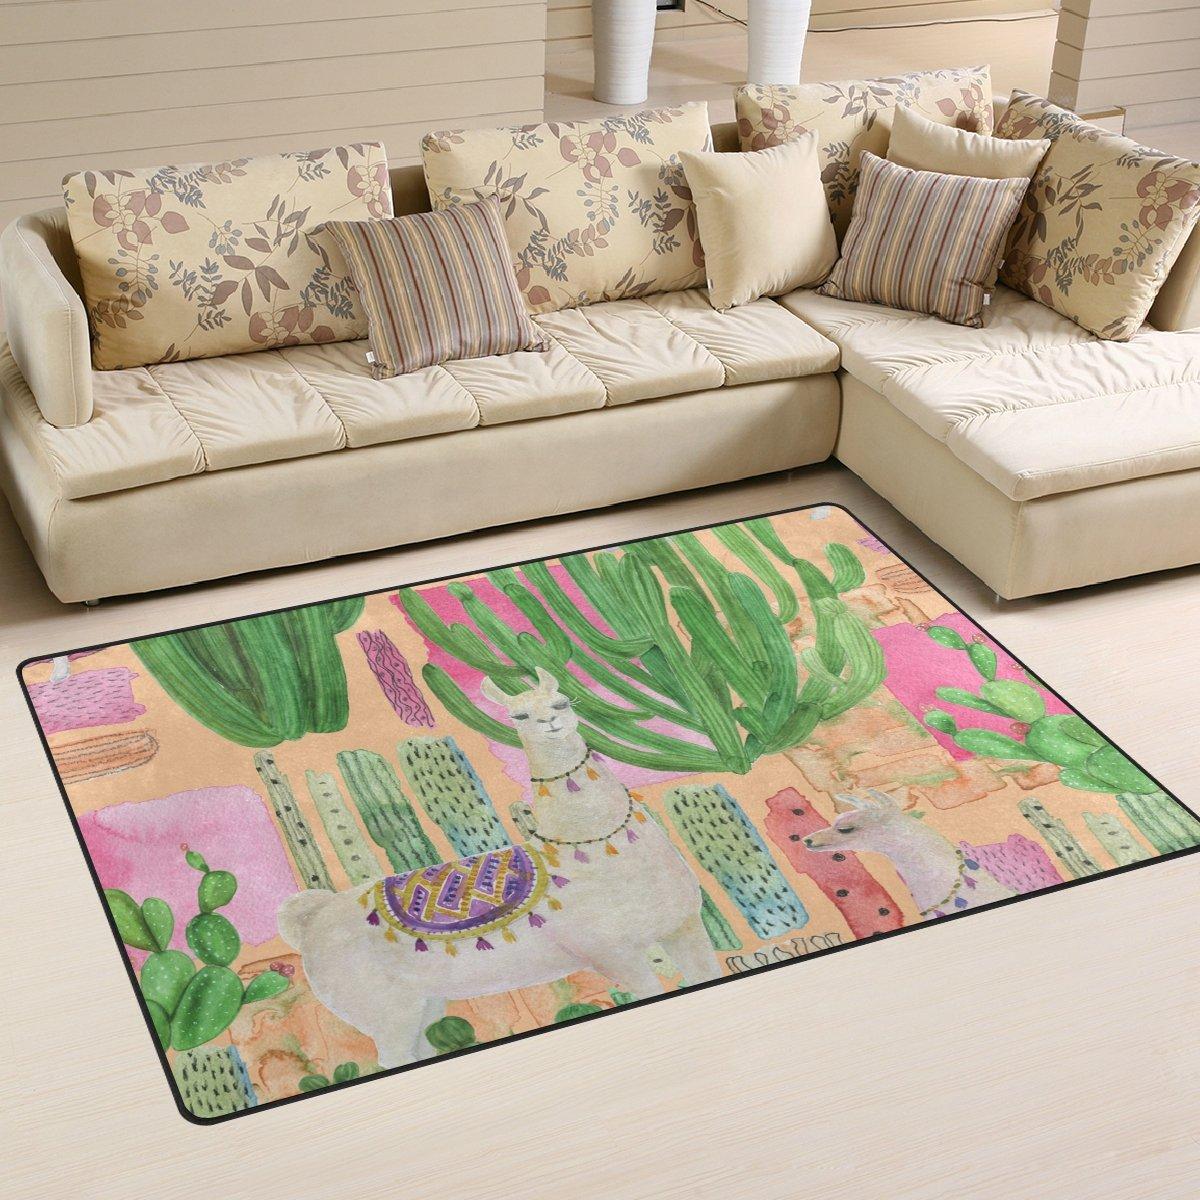 WellLee Area Rug, Watercolor Painting Tropical Llamas Cacti Floor Rug Non-Slip Doormat for Living Dining Dorm Room Bedroom Decor 60x39 inch WelllLee dtfh-001